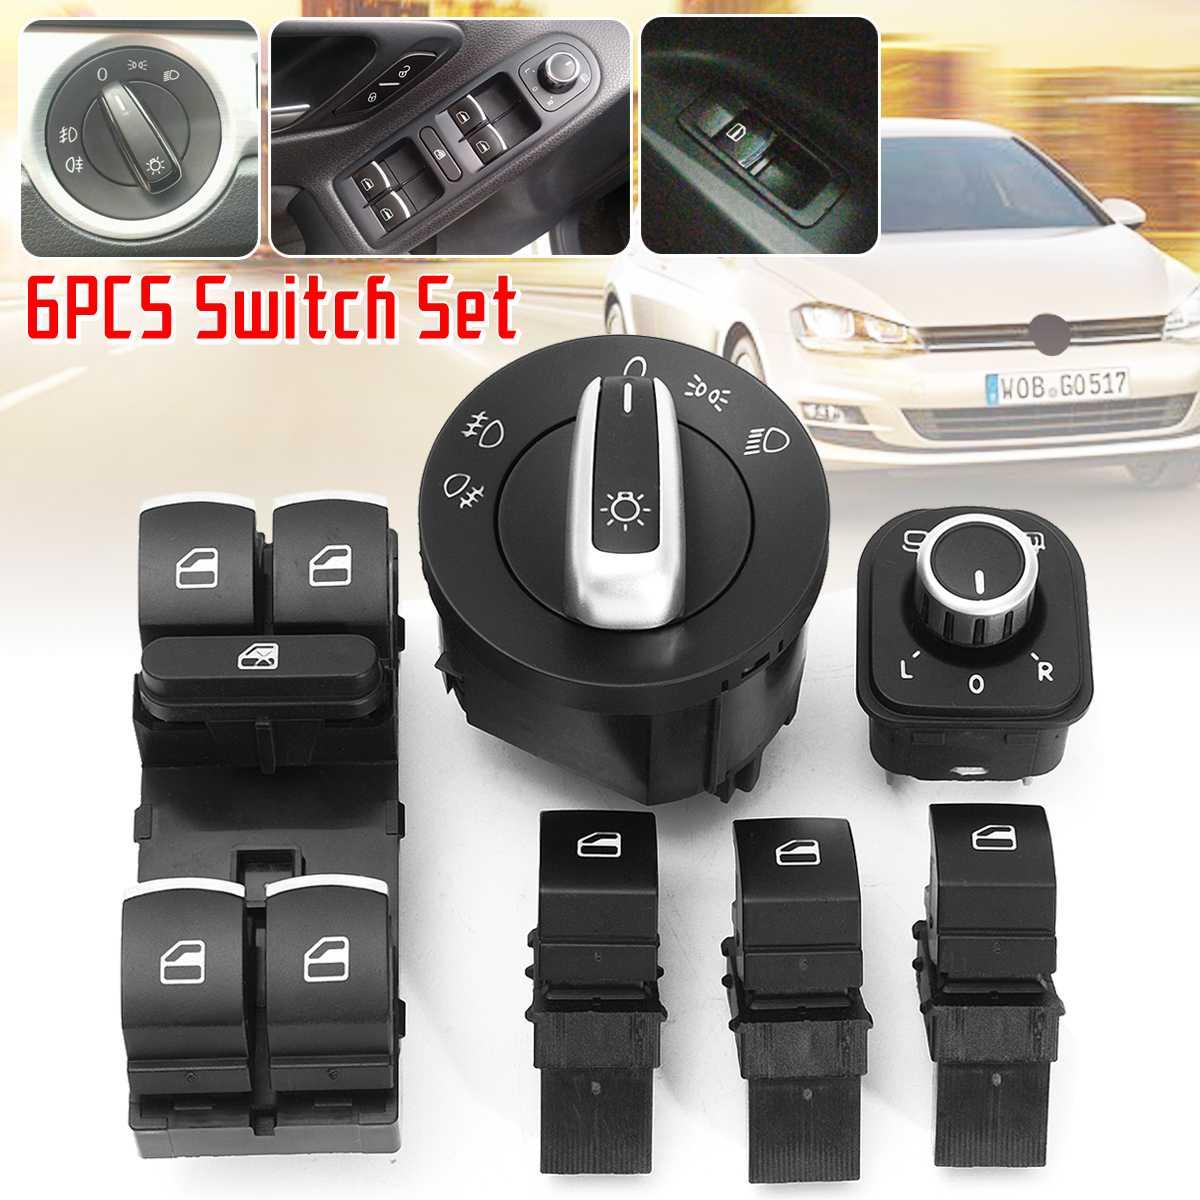 6pcs Car Power Master Window กระจกควบคุมสวิทช์ไฟหน้า 5ND959857 5ND959565B สำหรับ VW Jetta Golf MK5 6